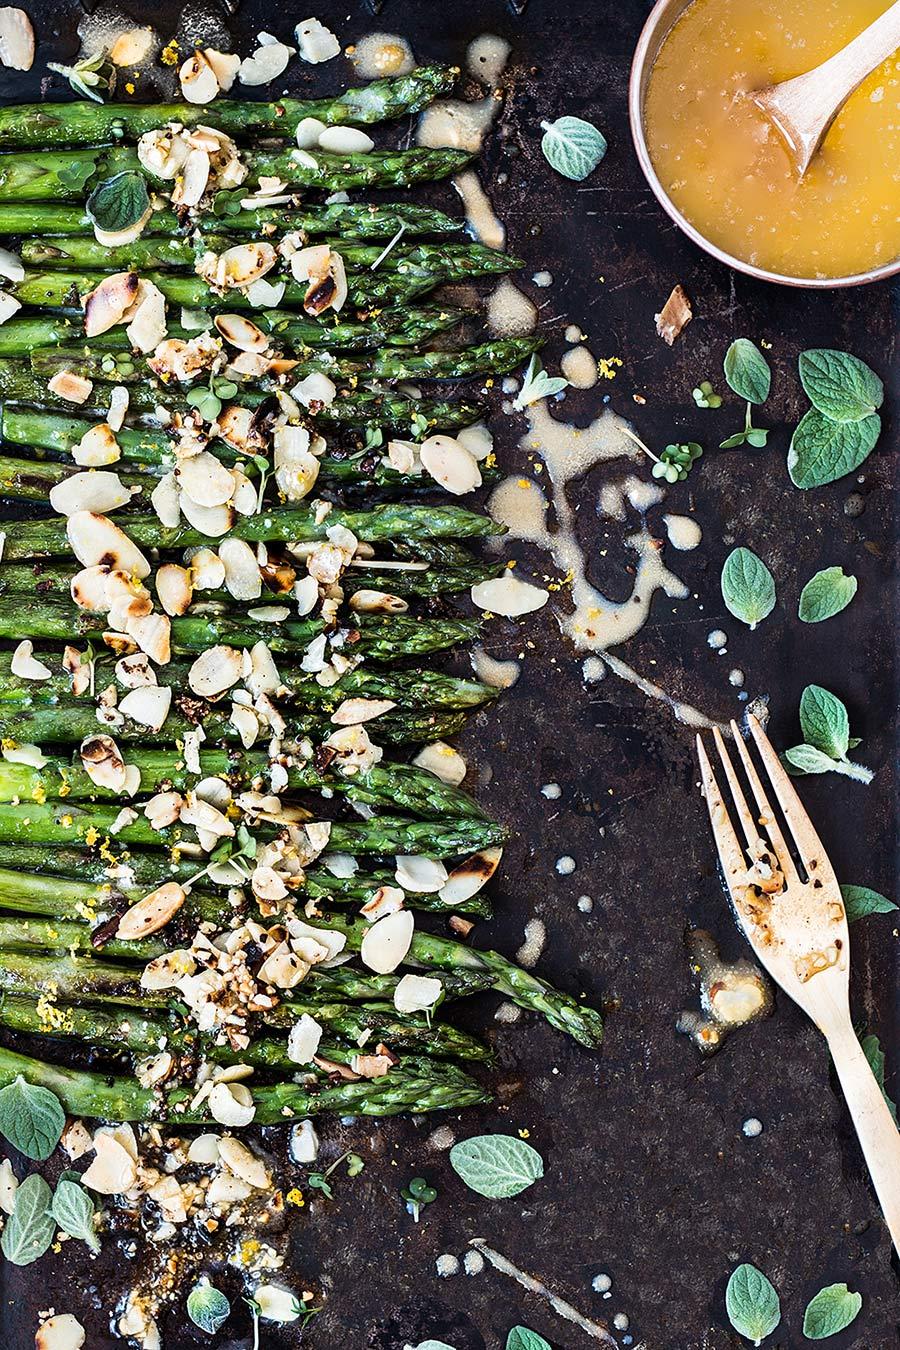 Asparagus by Laura Domingo